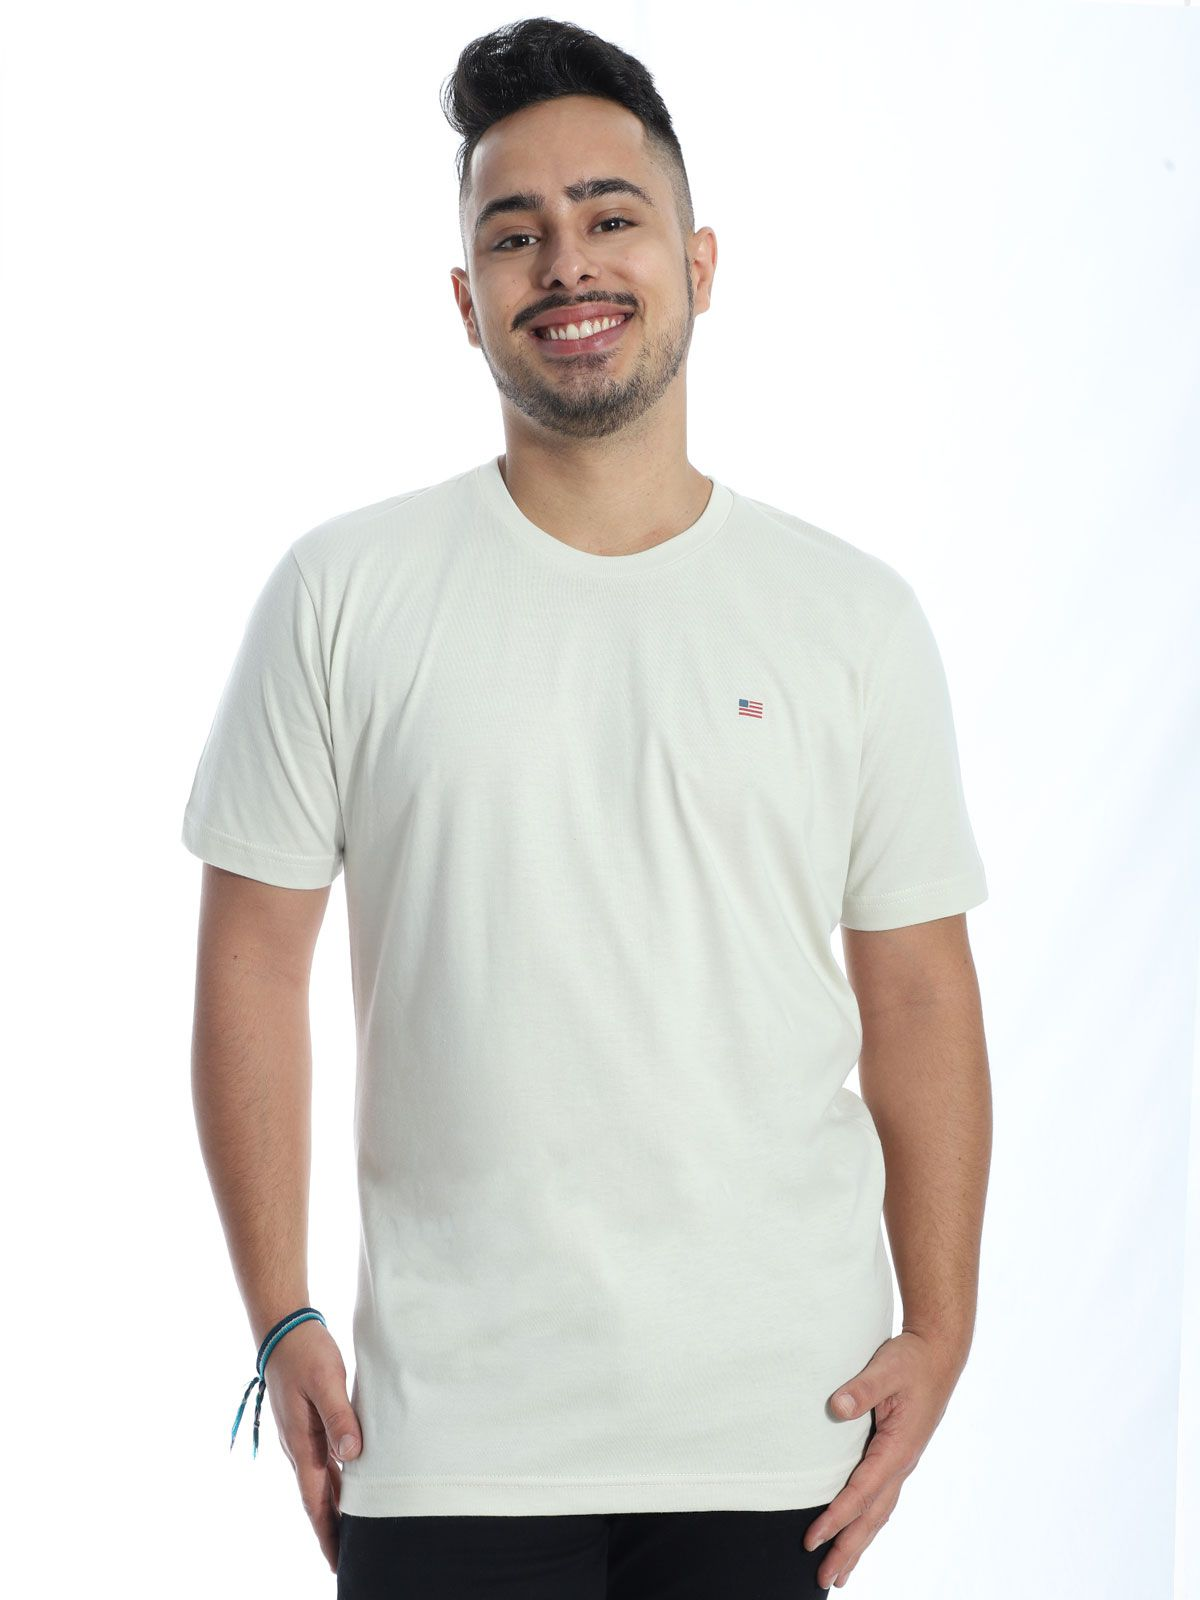 Camiseta Masculina Básica Manga Curta Estampada Areia